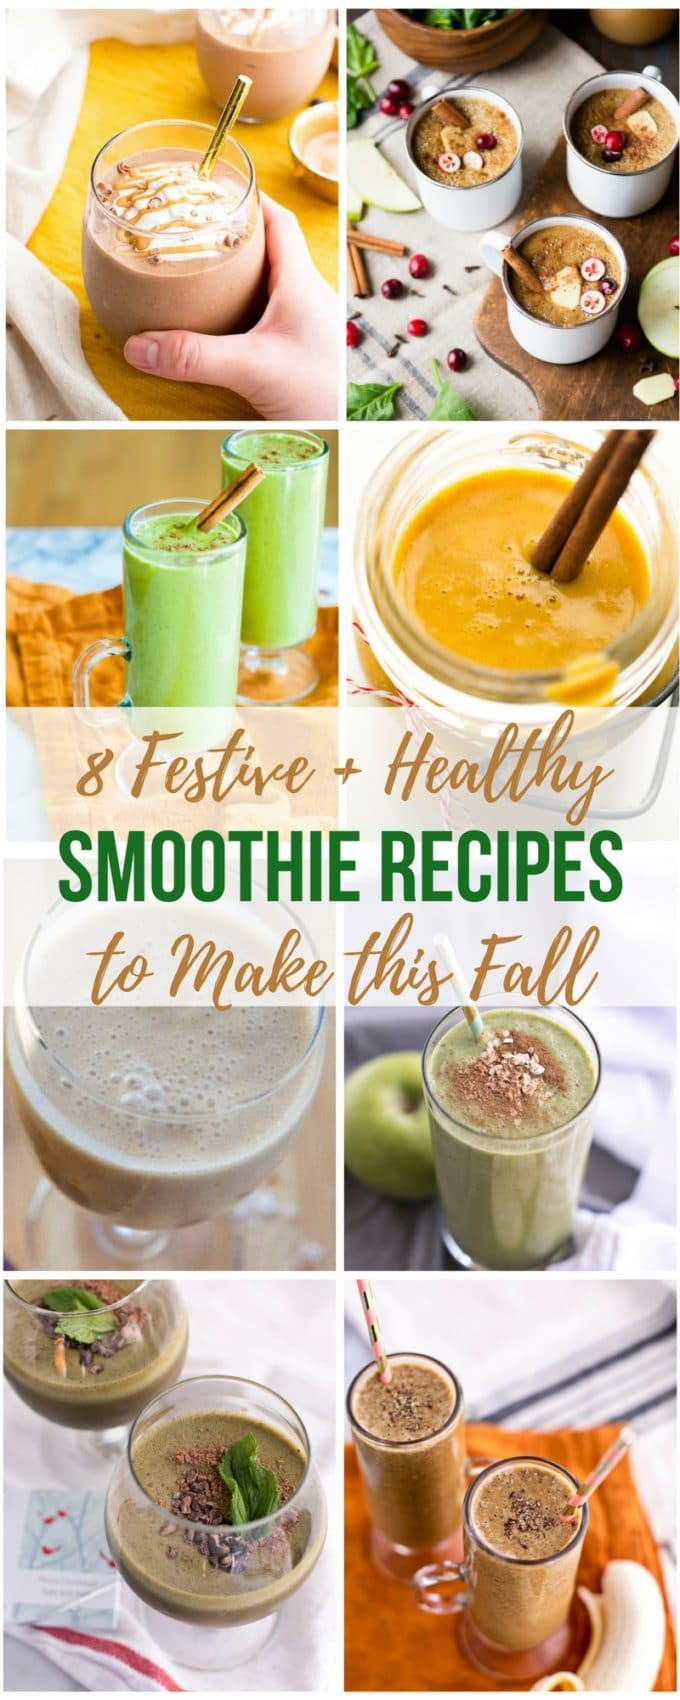 Healthy Fall Breakfast Recipes  8 Festive Healthy Breakfast Smoothie Recipes to Make